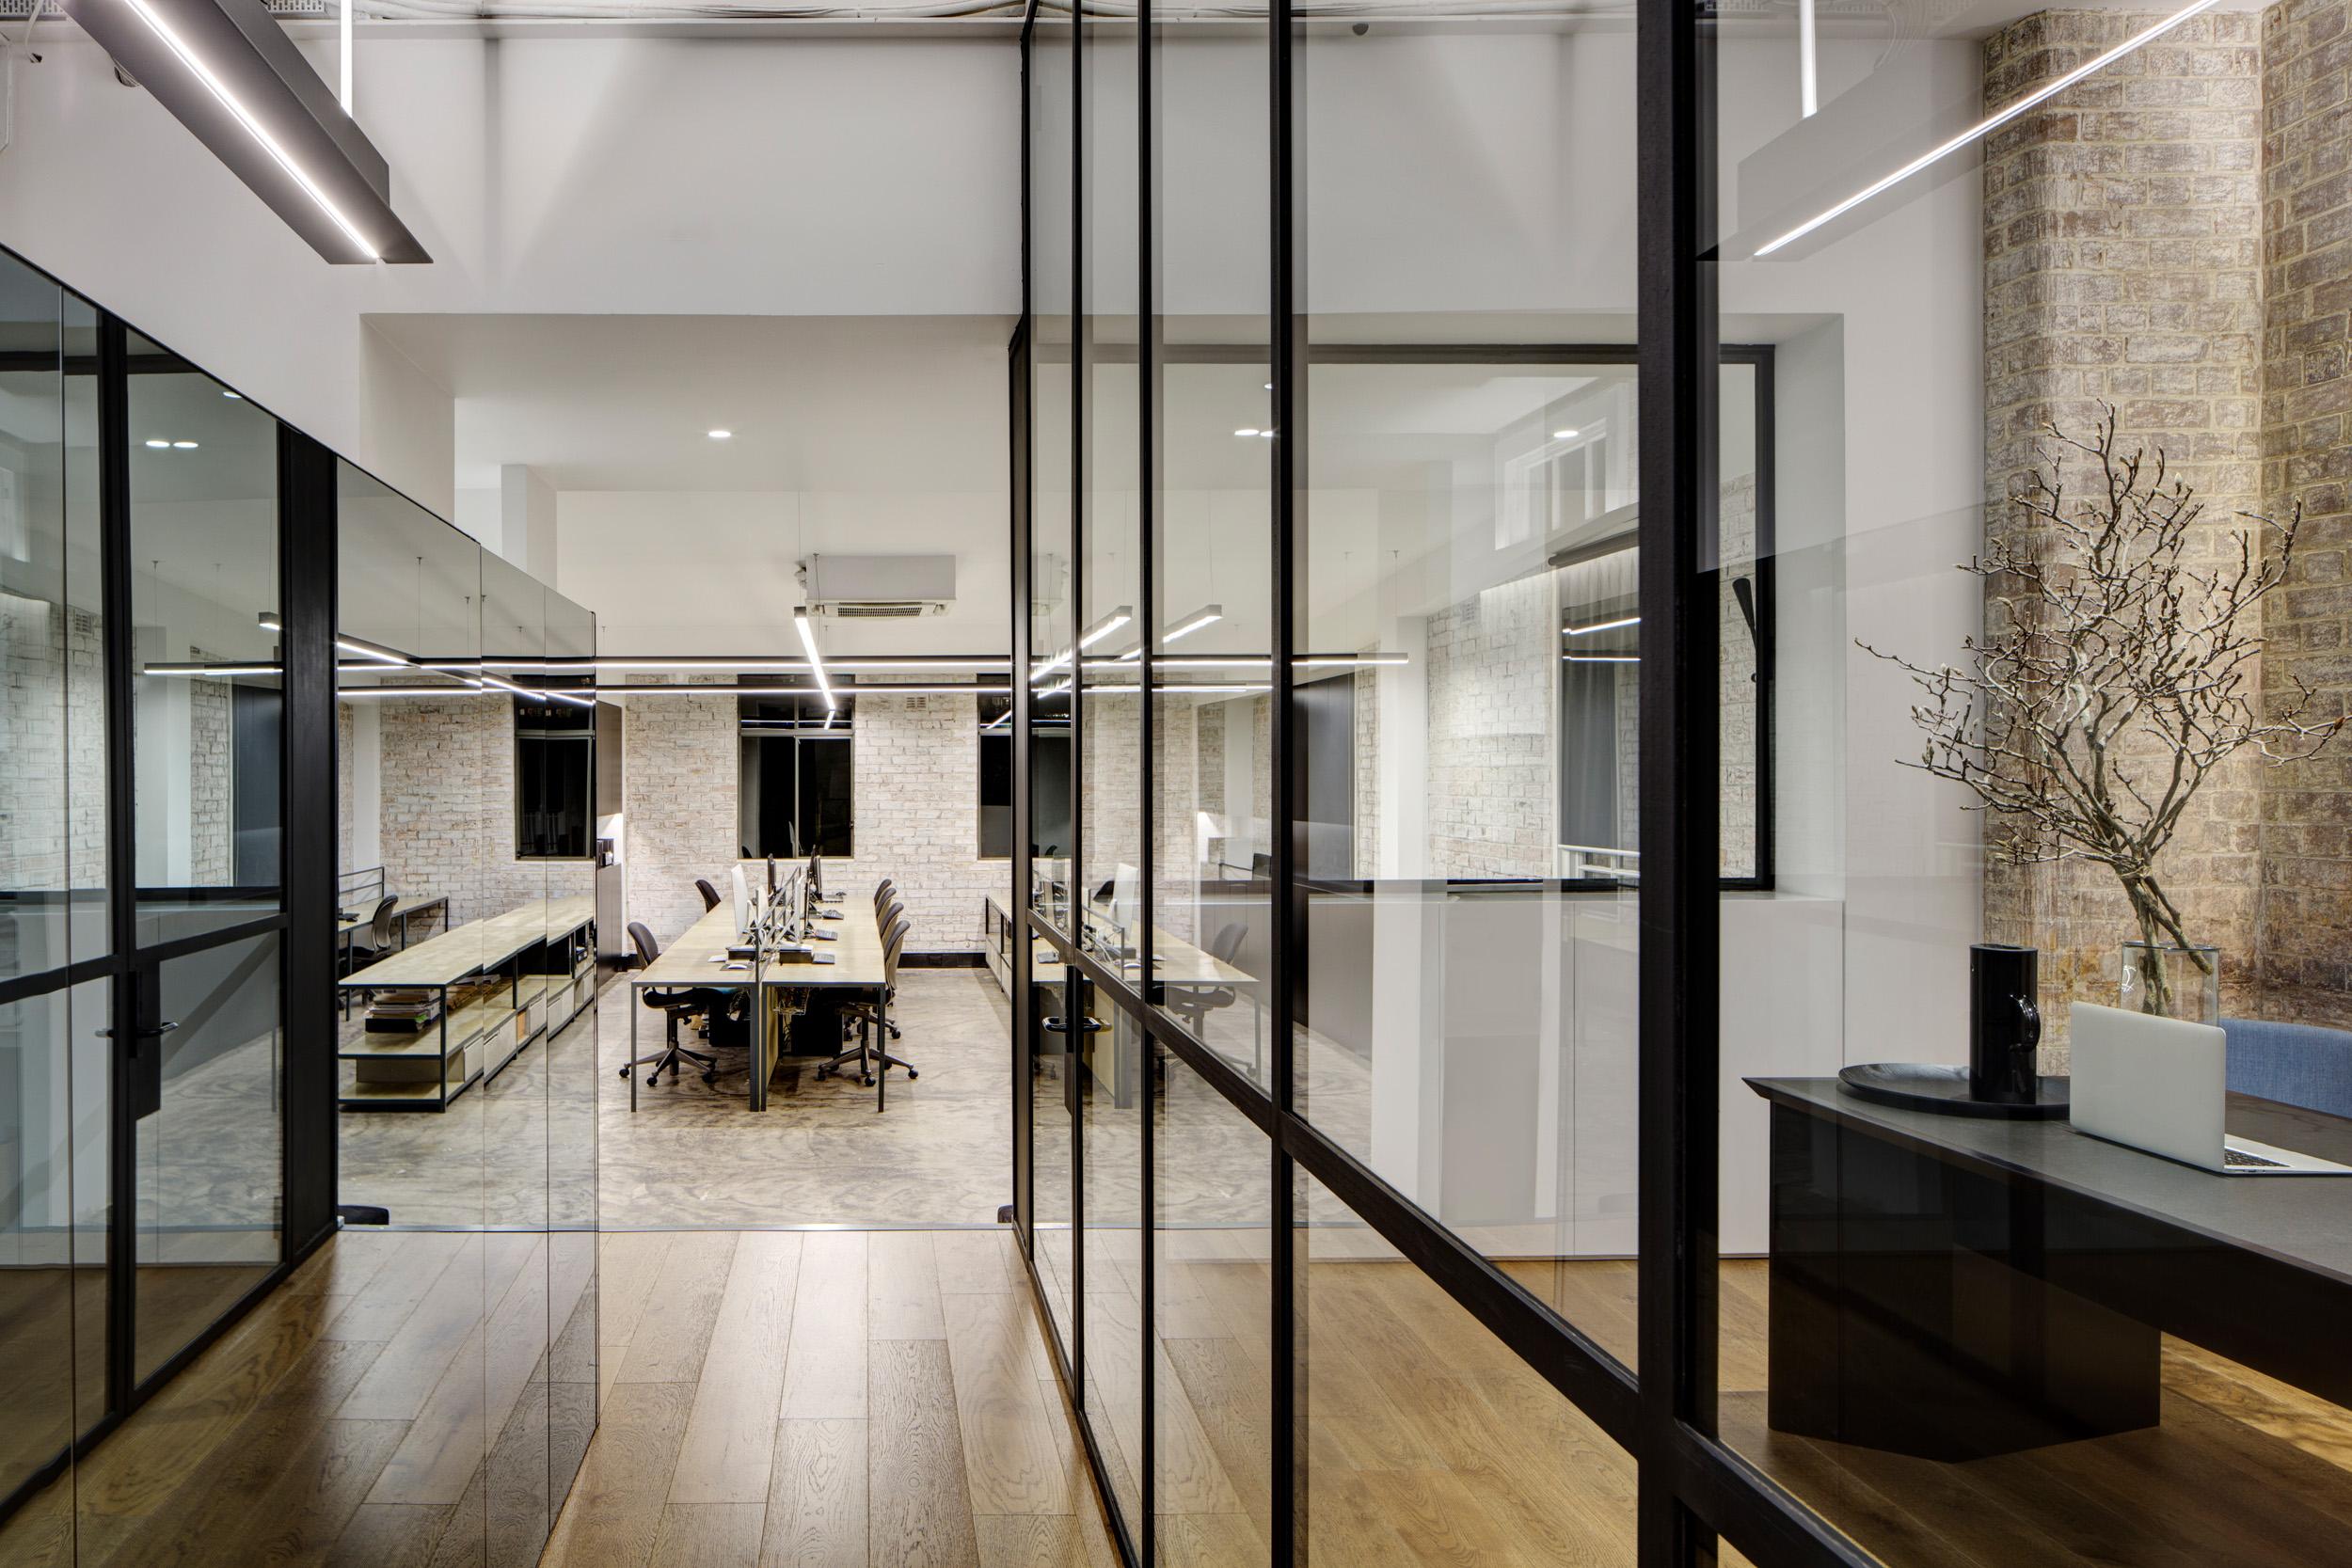 Jem_Cresswell_Architecture_Commercial_Photographer_Sydney_Australia_007.jpg